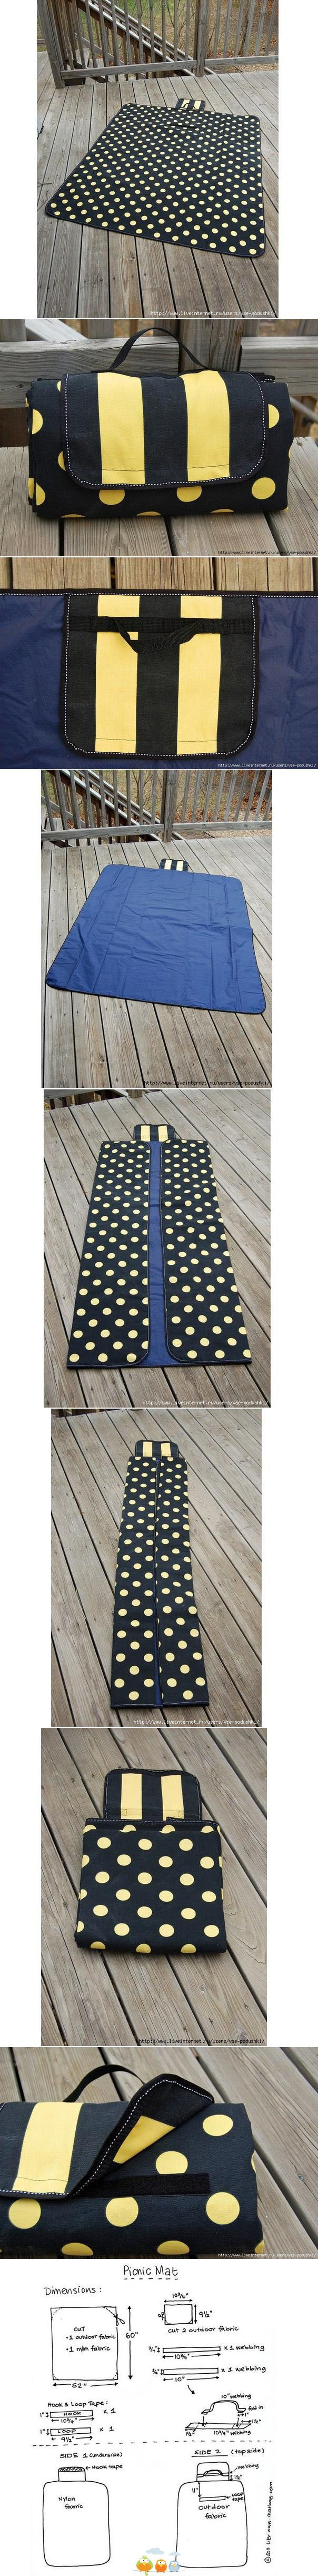 picnic mat - awesome